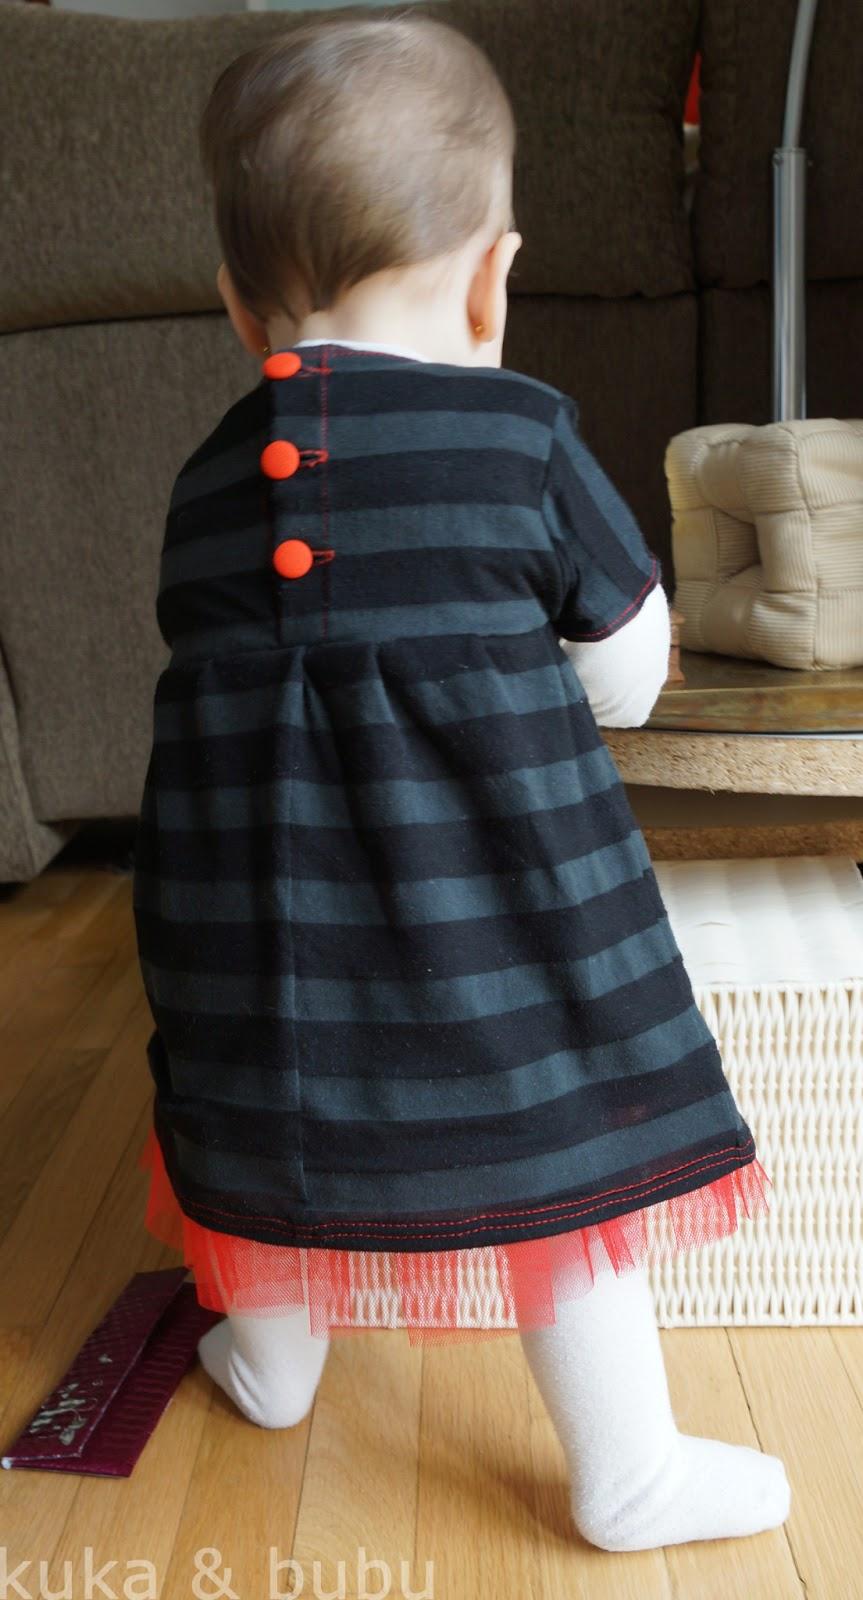 http://kukaandbubu.blogspot.com.es/2013/03/tutorial-and-free-pattern-beebee-dress.html